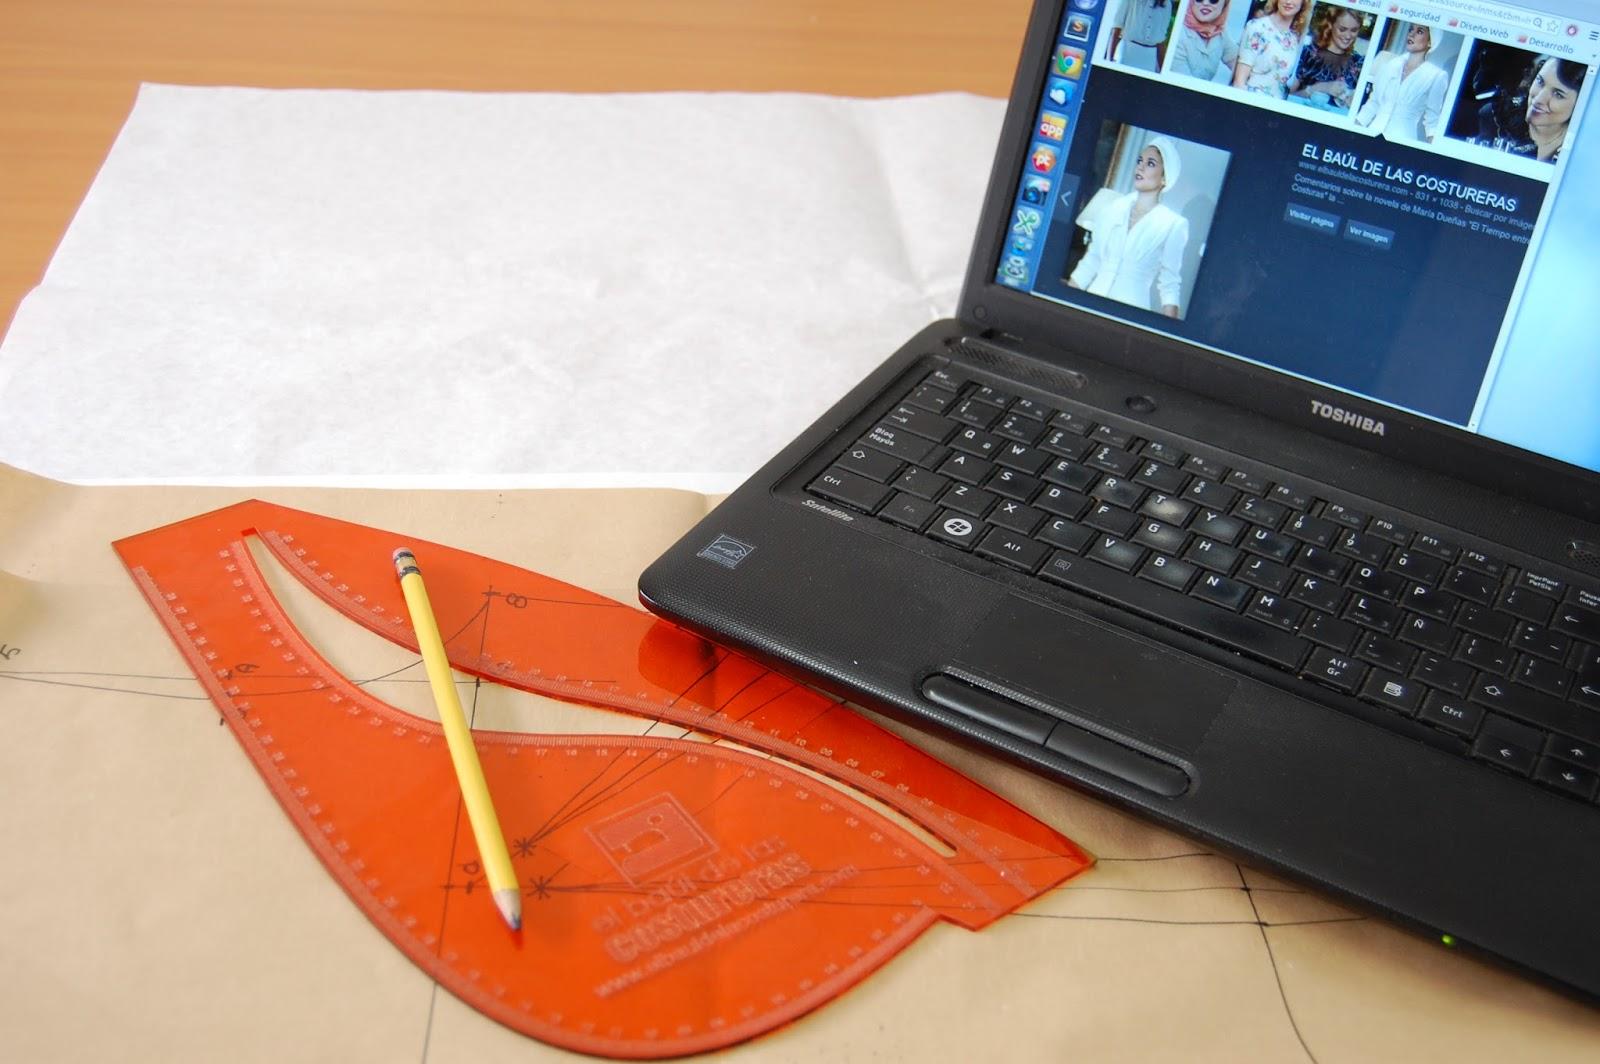 Molde-tutorial-confeccion-trajes-sira-quiroga-rosalinda-fox-tiempo-entre-costuras